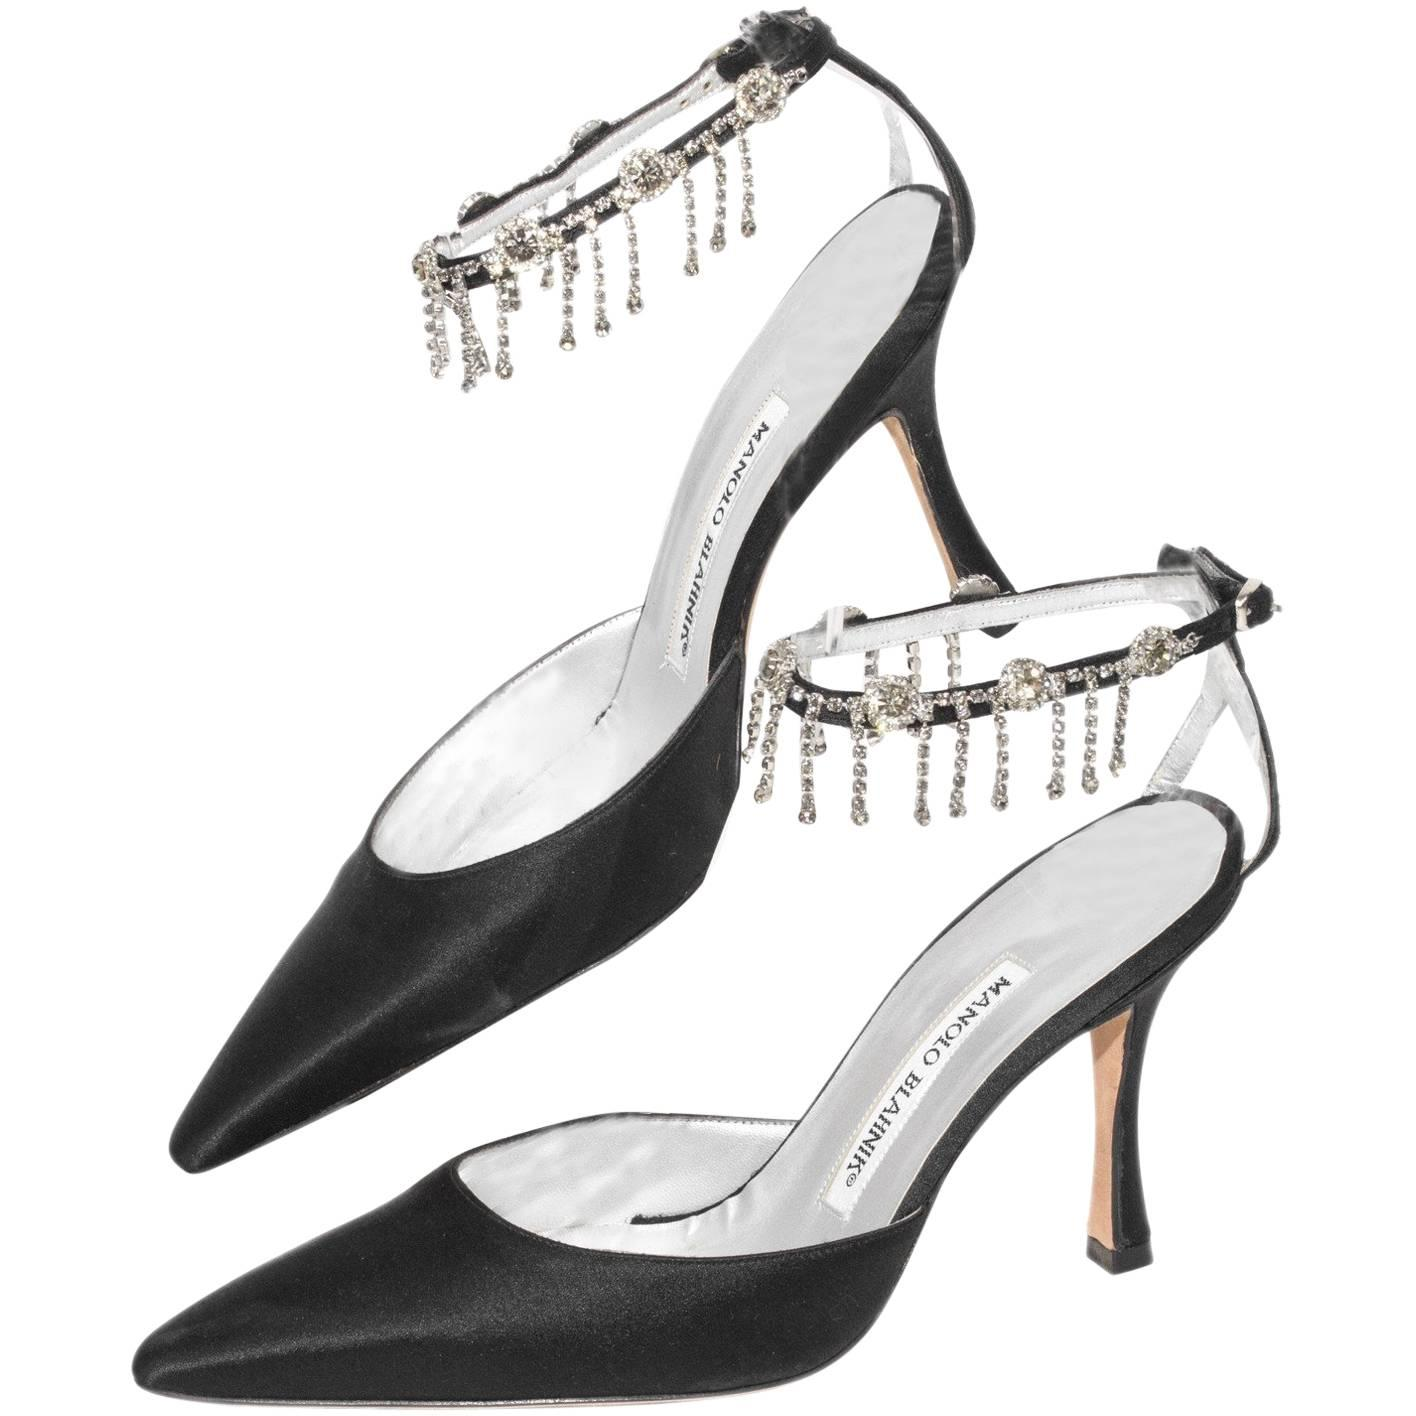 Manolo Blahnik Black Satin Pointy Toe Heel With Rhinestone Ankle Strap